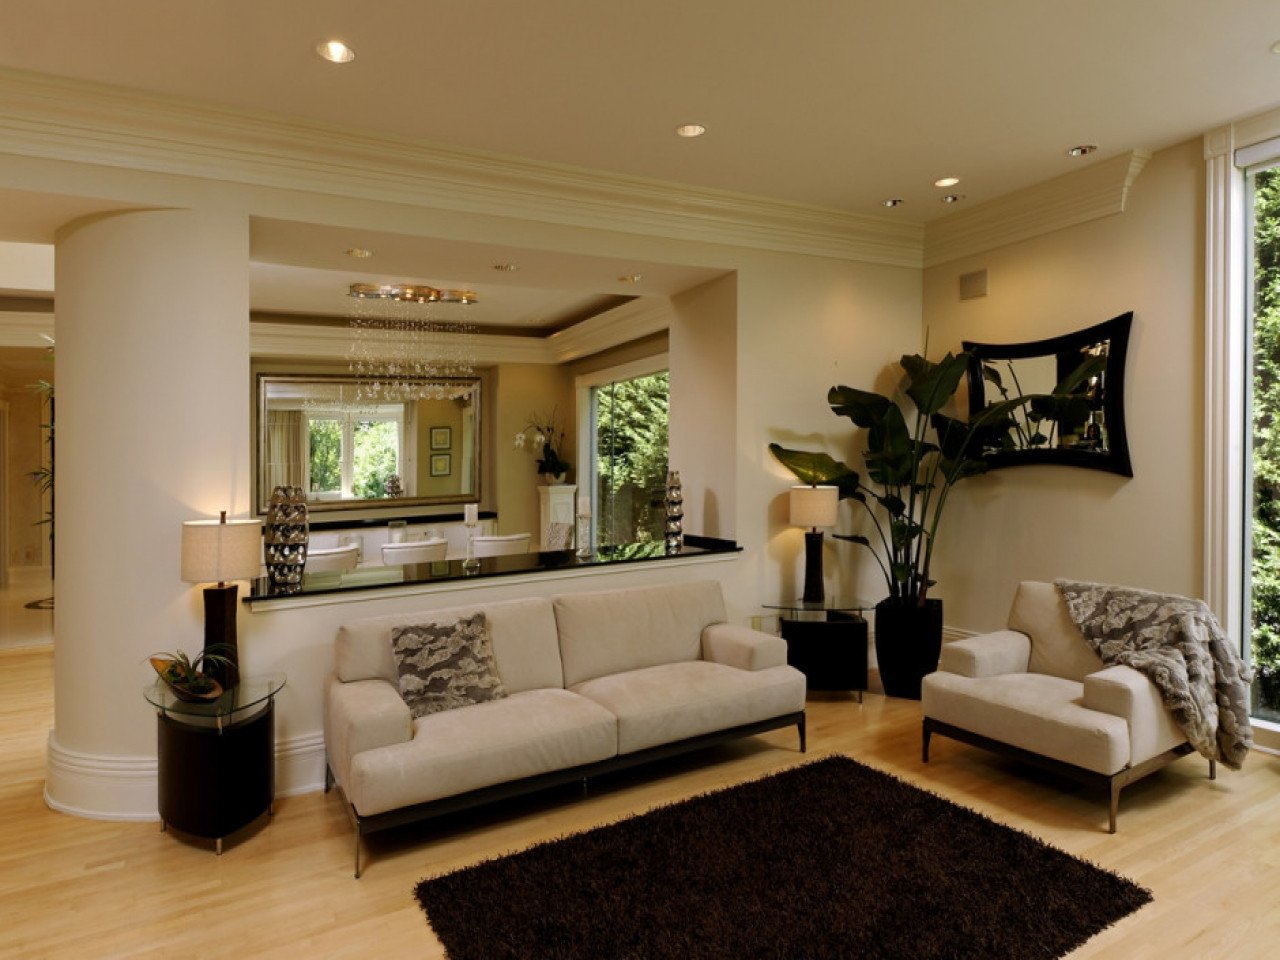 Neutral Living Room Color Ideas Cream Colored Carpet Living Room Neutral Colors with Wood